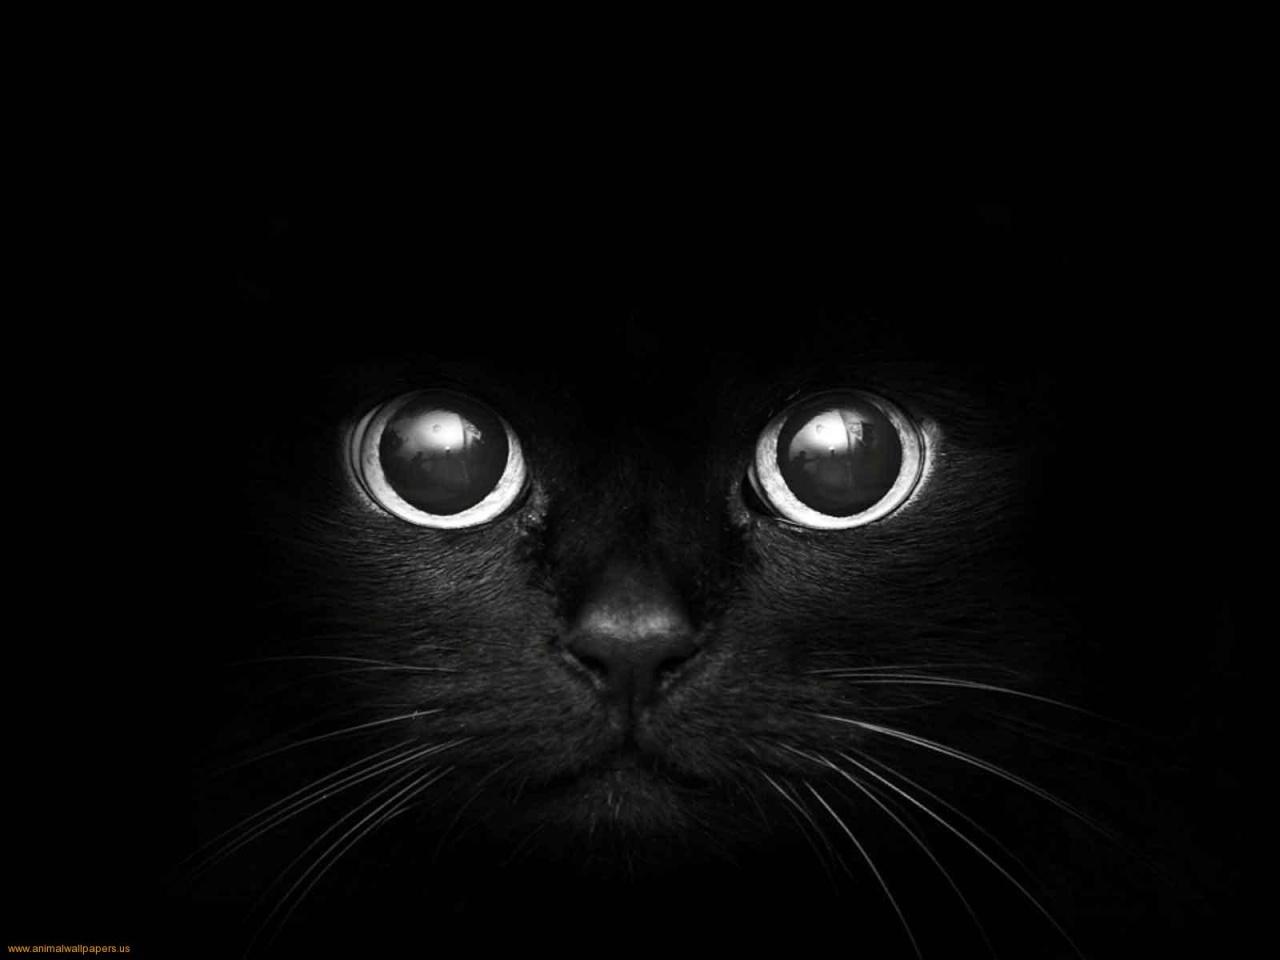 Black Cat Background Tumblr Ef s World